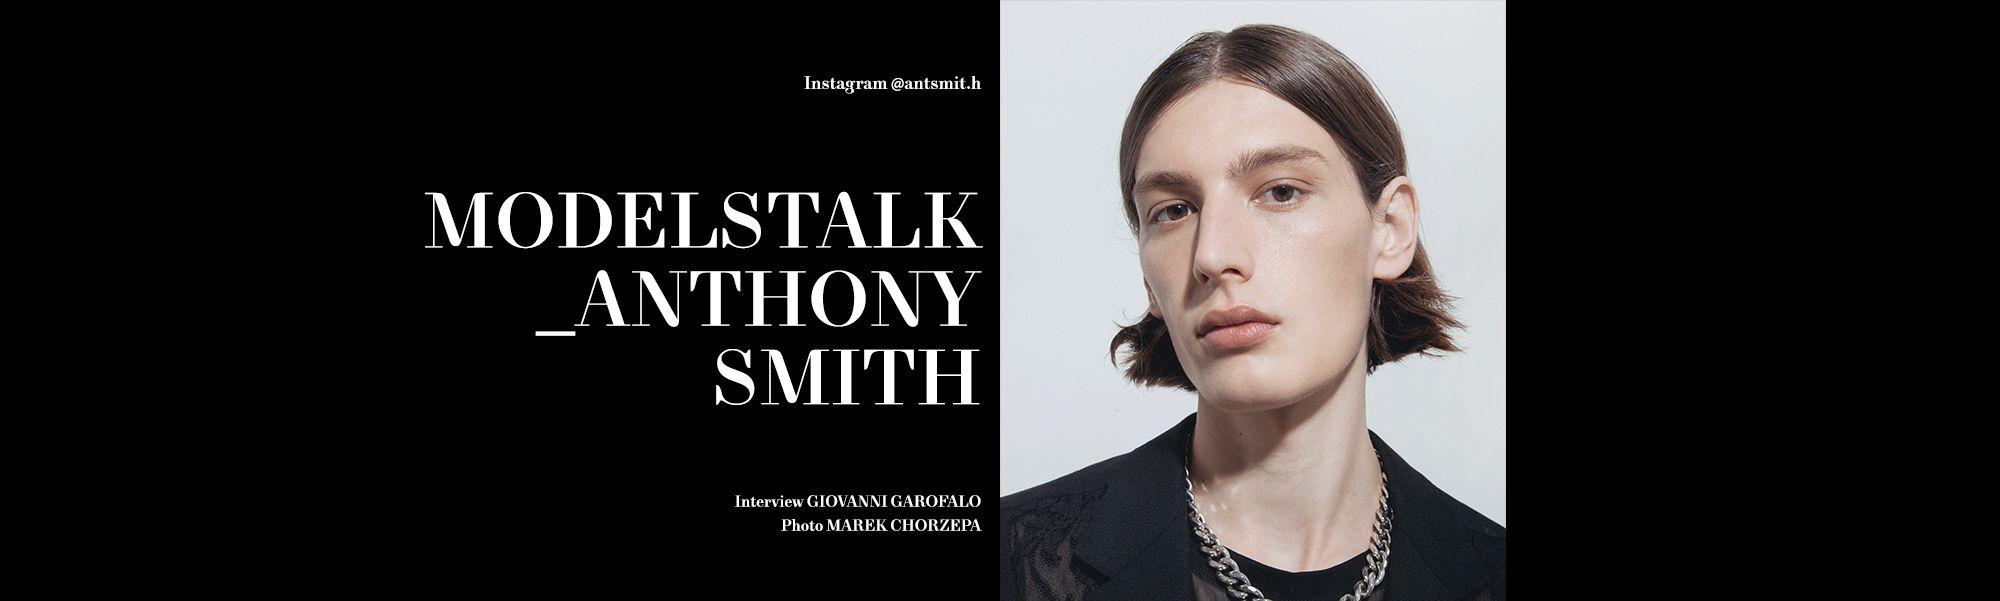 anthony-smith-thegreatestmagazine-talking-heads-banner